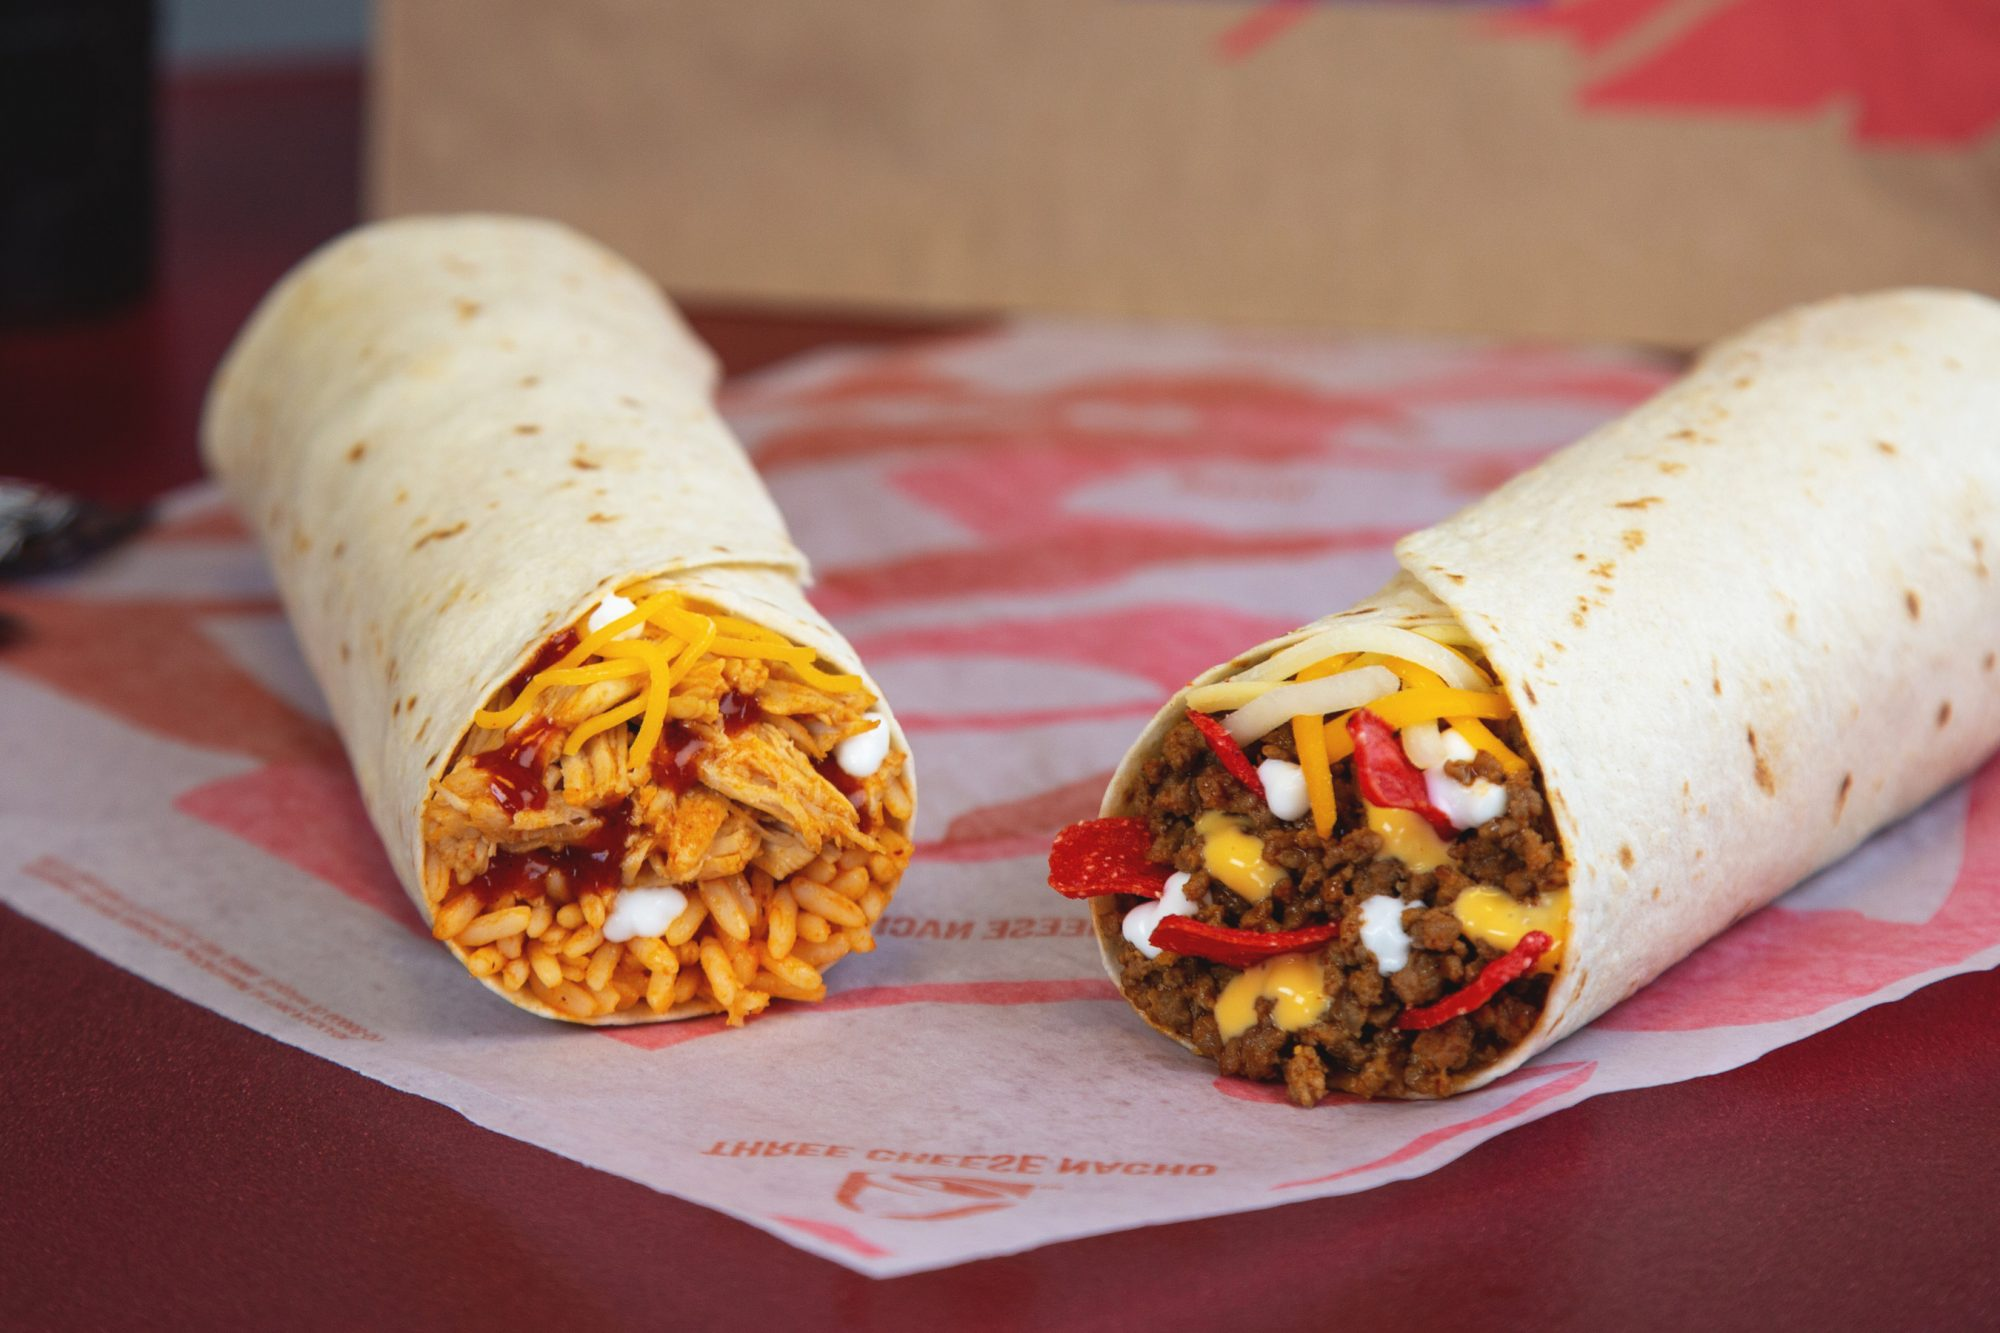 Taco Bell Unveils Massive $1 Burritos as Part of New Value Menu